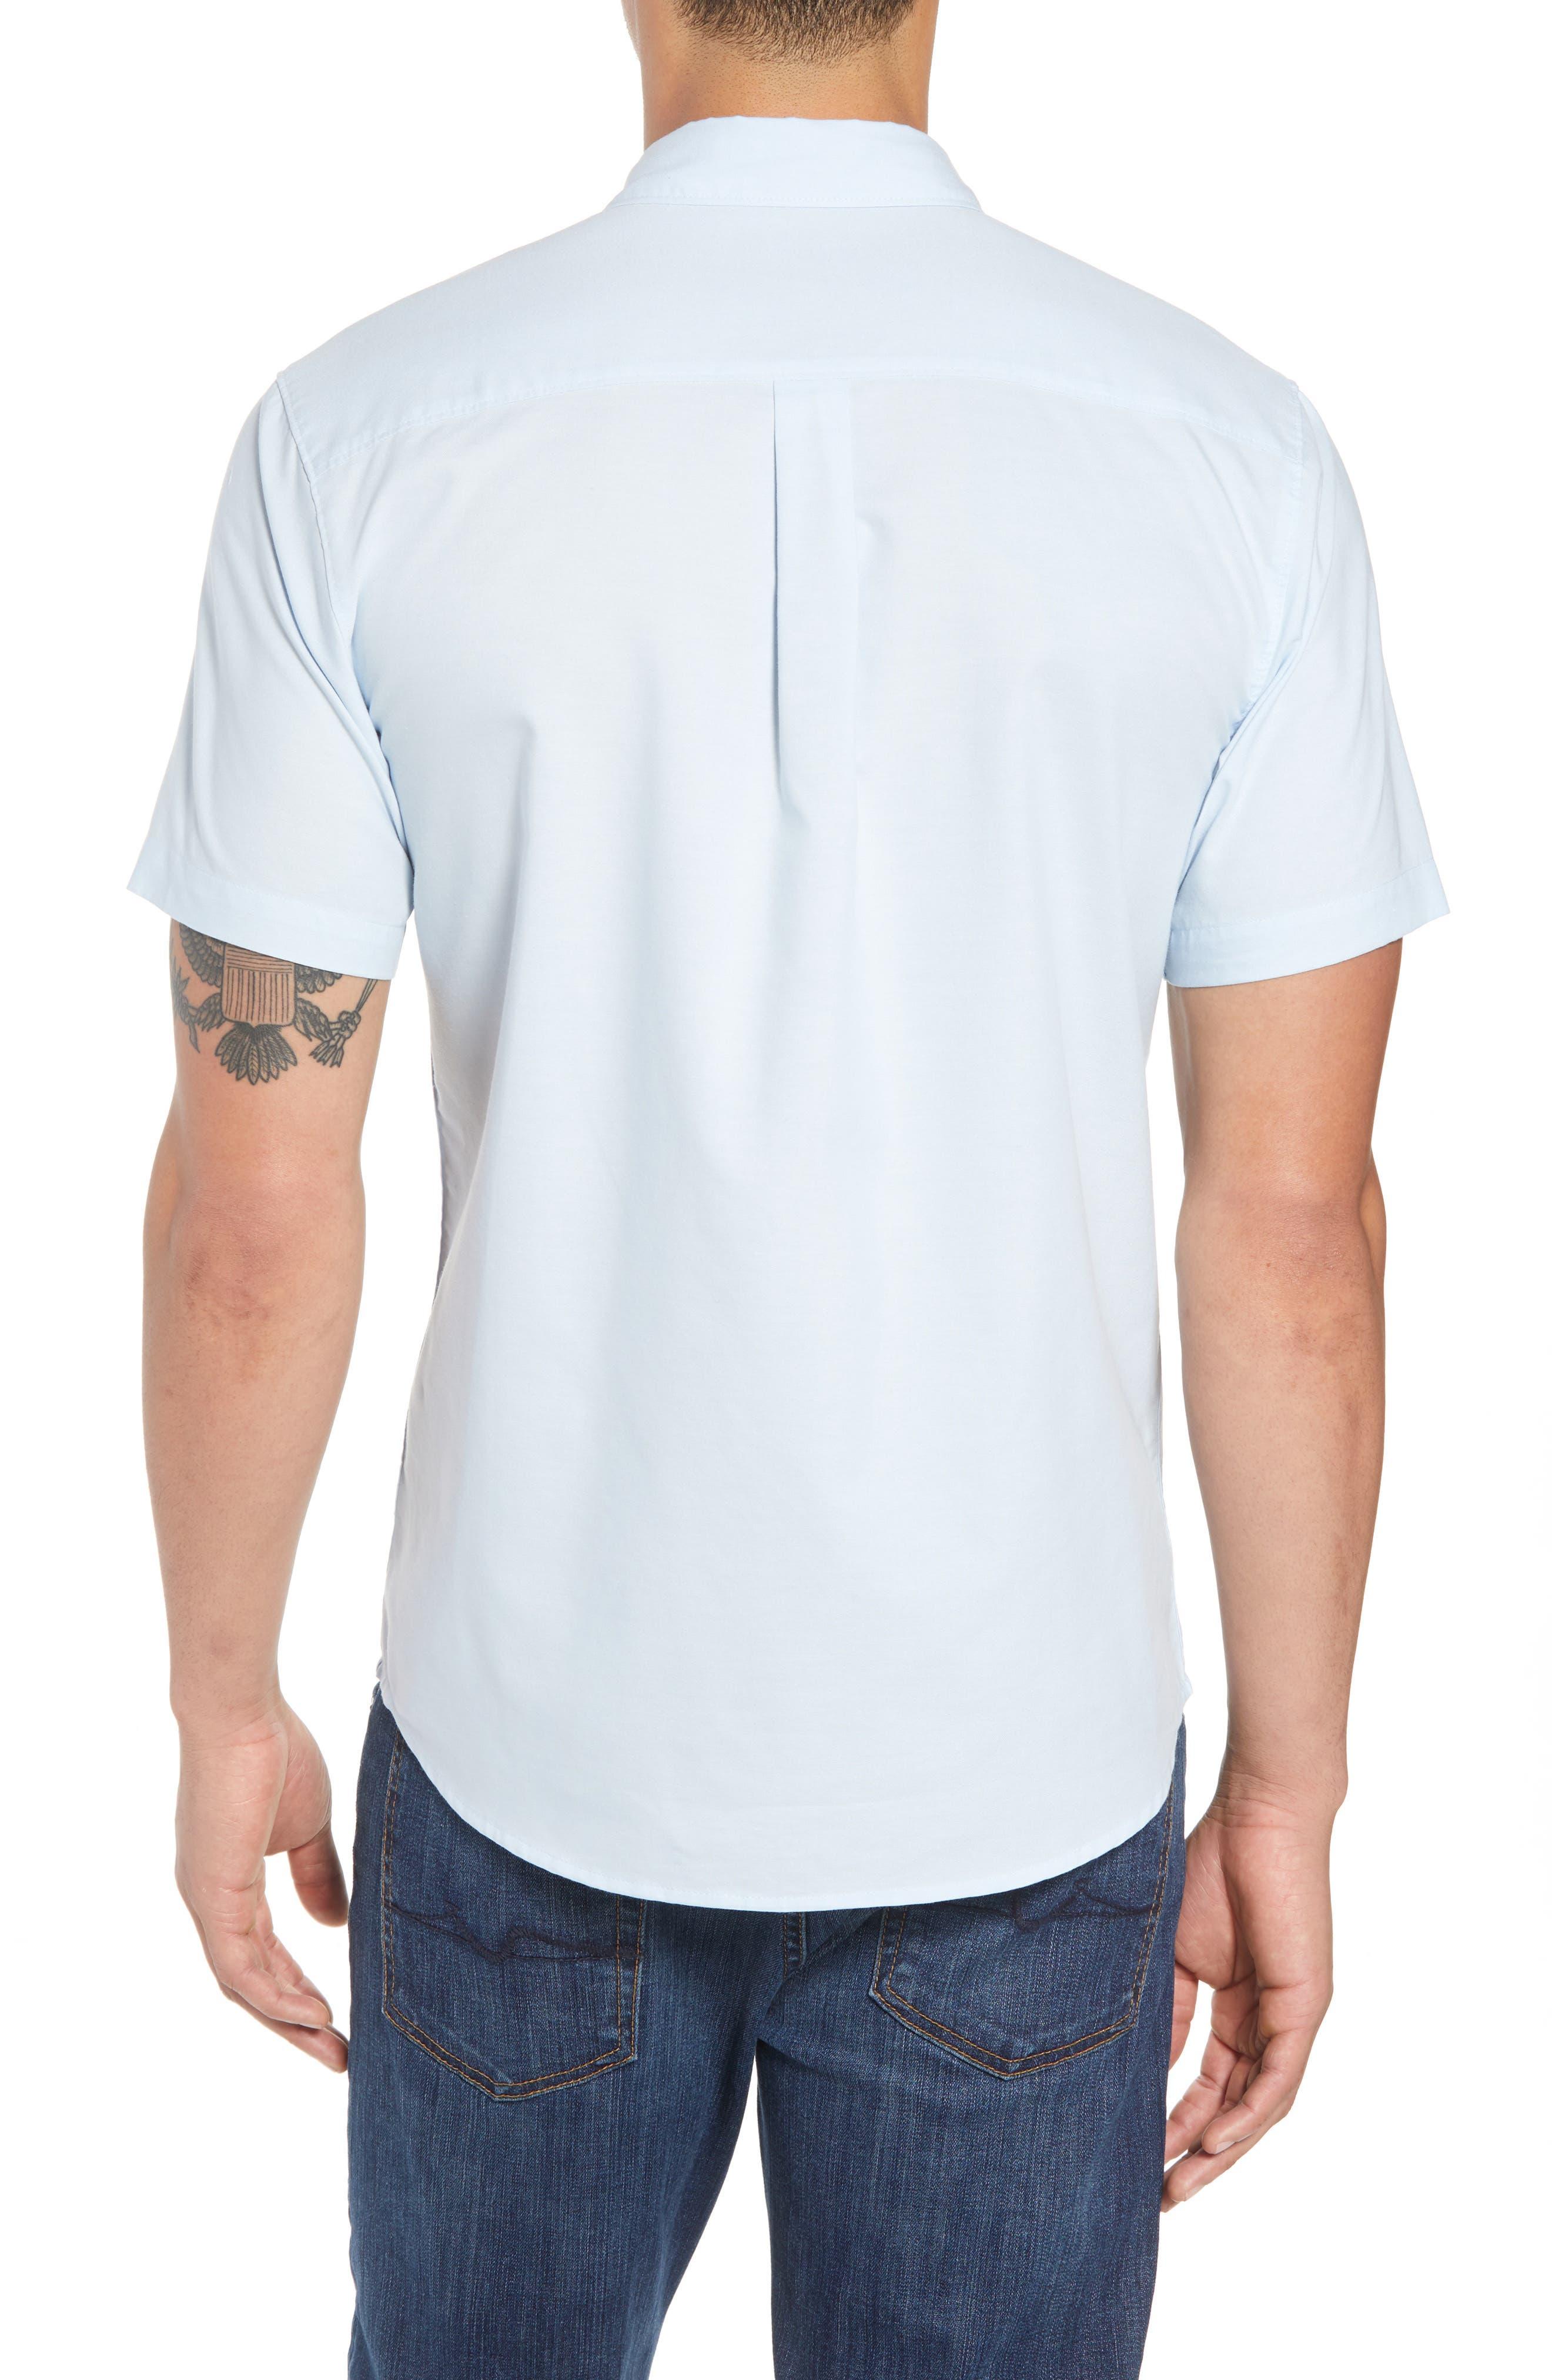 Banks Woven Shirt,                             Alternate thumbnail 2, color,                             LIGHT BLUE